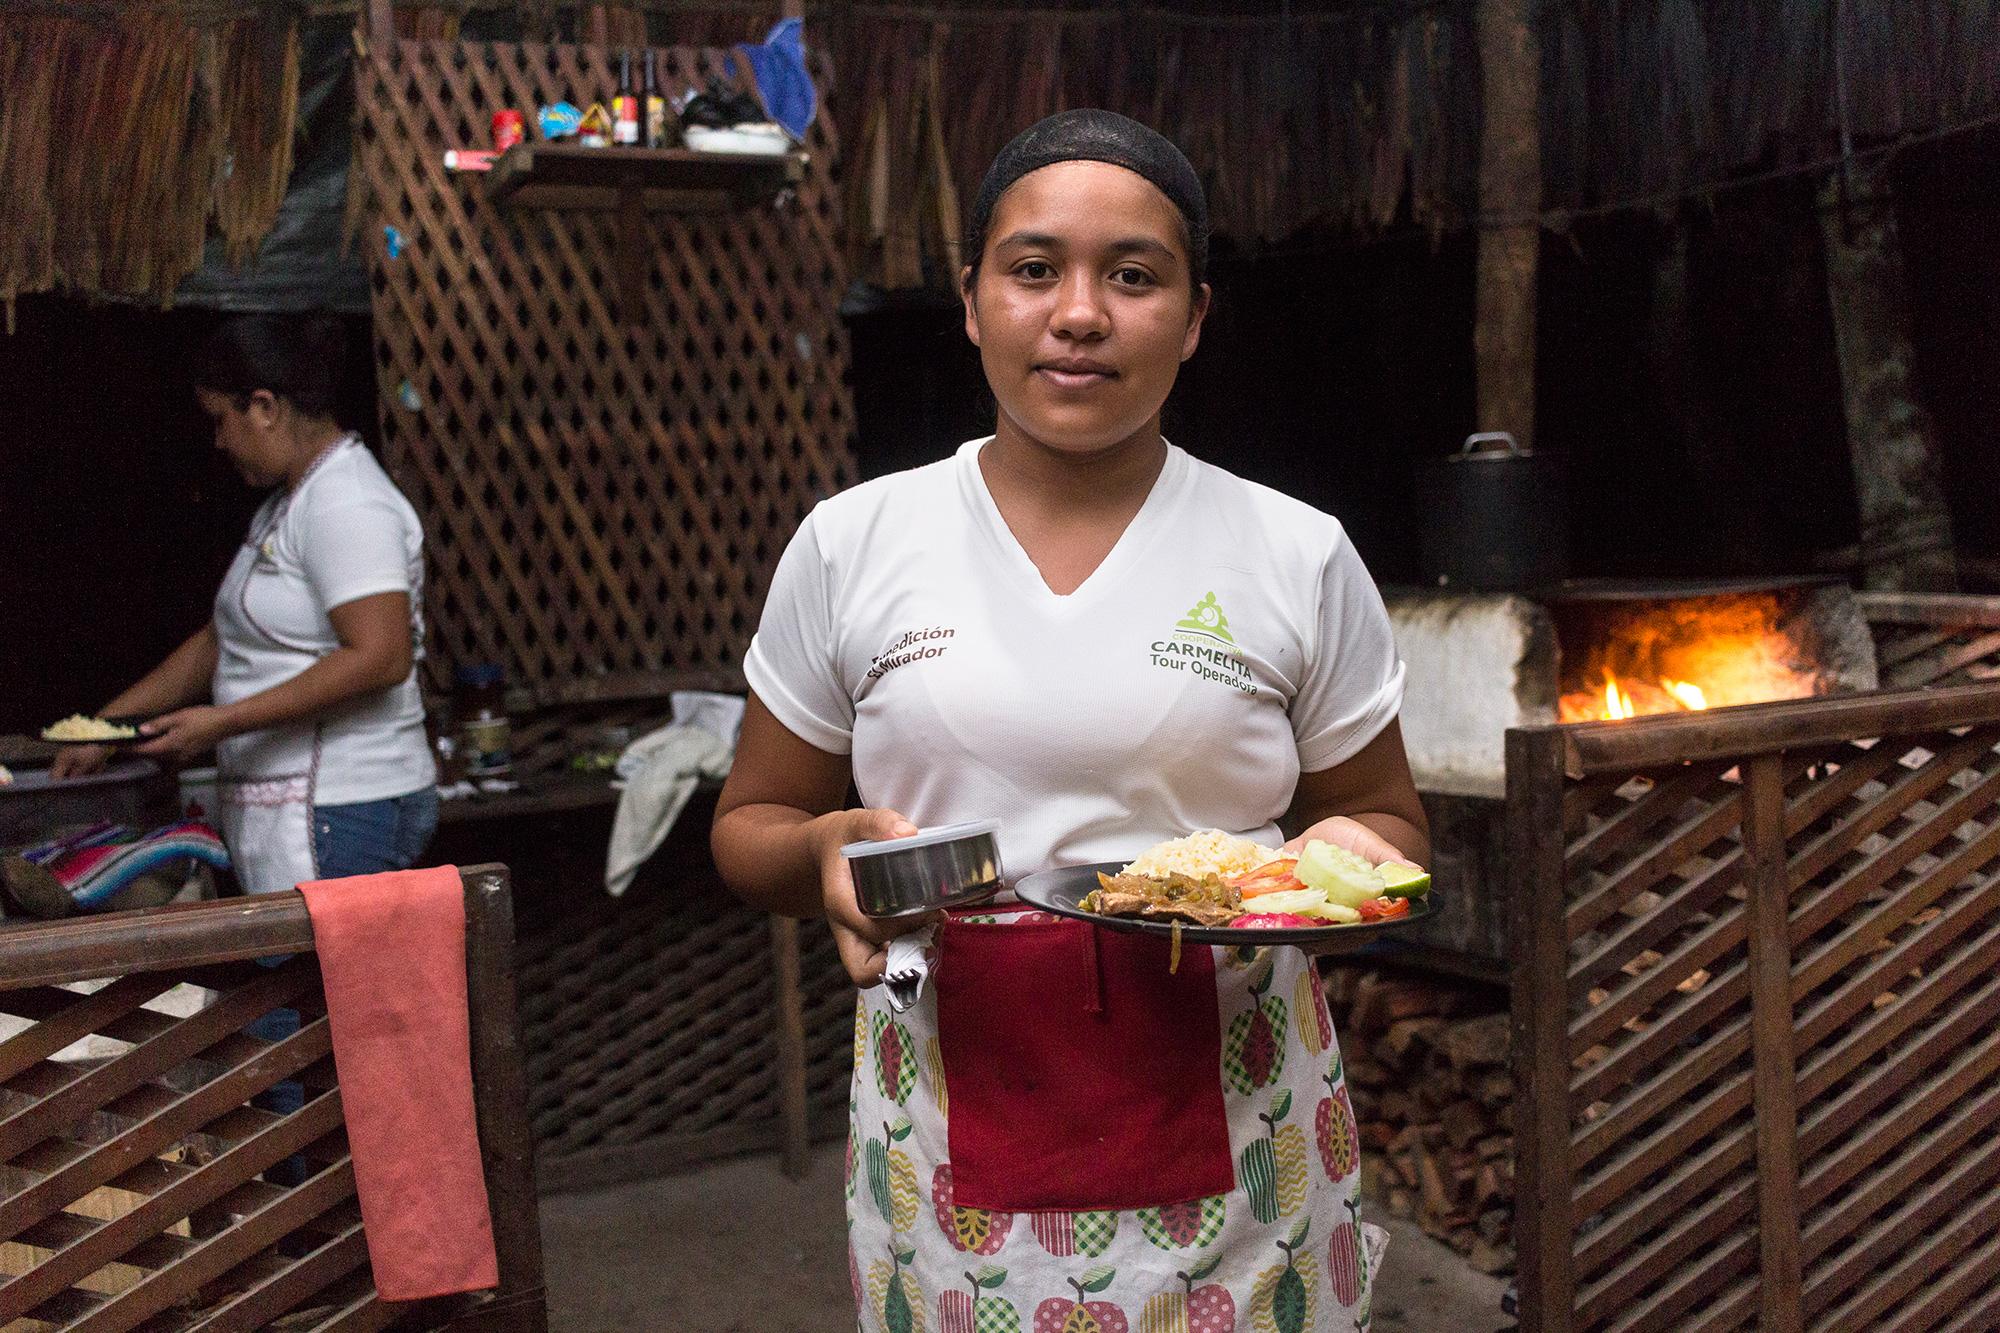 Cocinera Cooperativa Carmelita